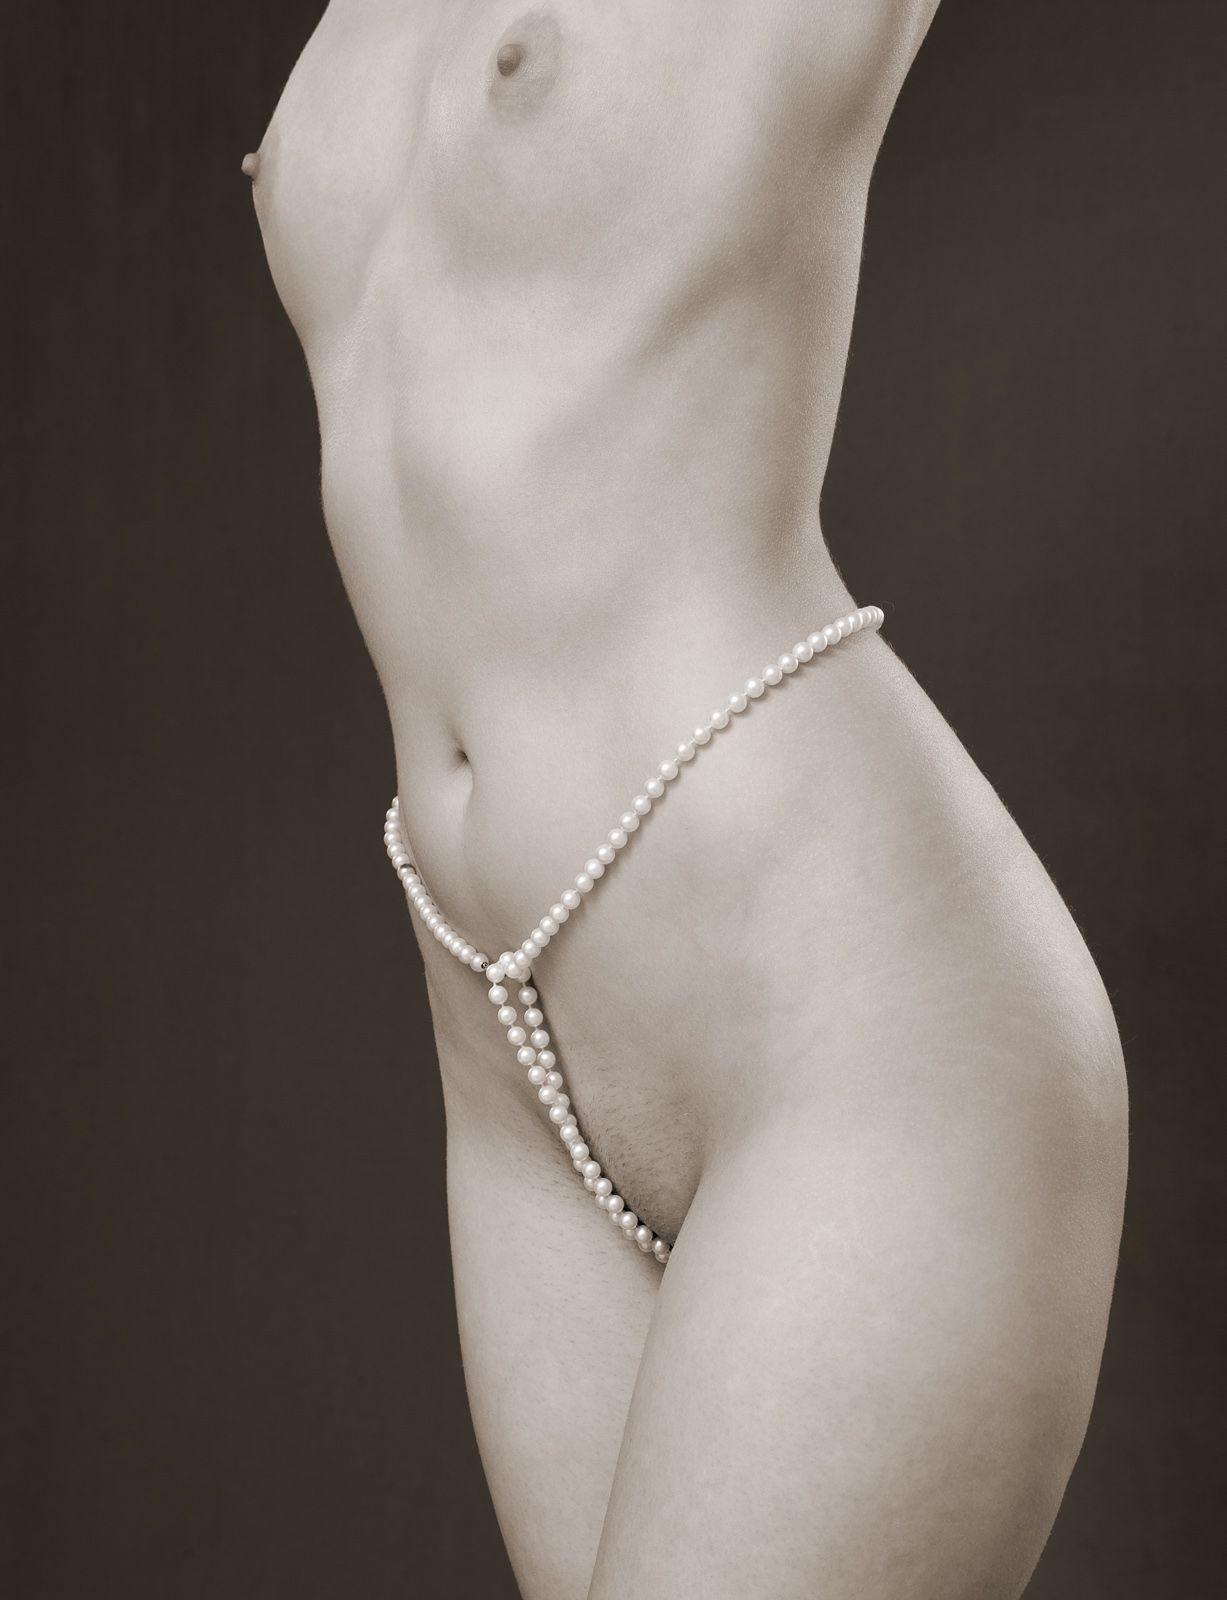 Free Breast Rubbing Porn Galery